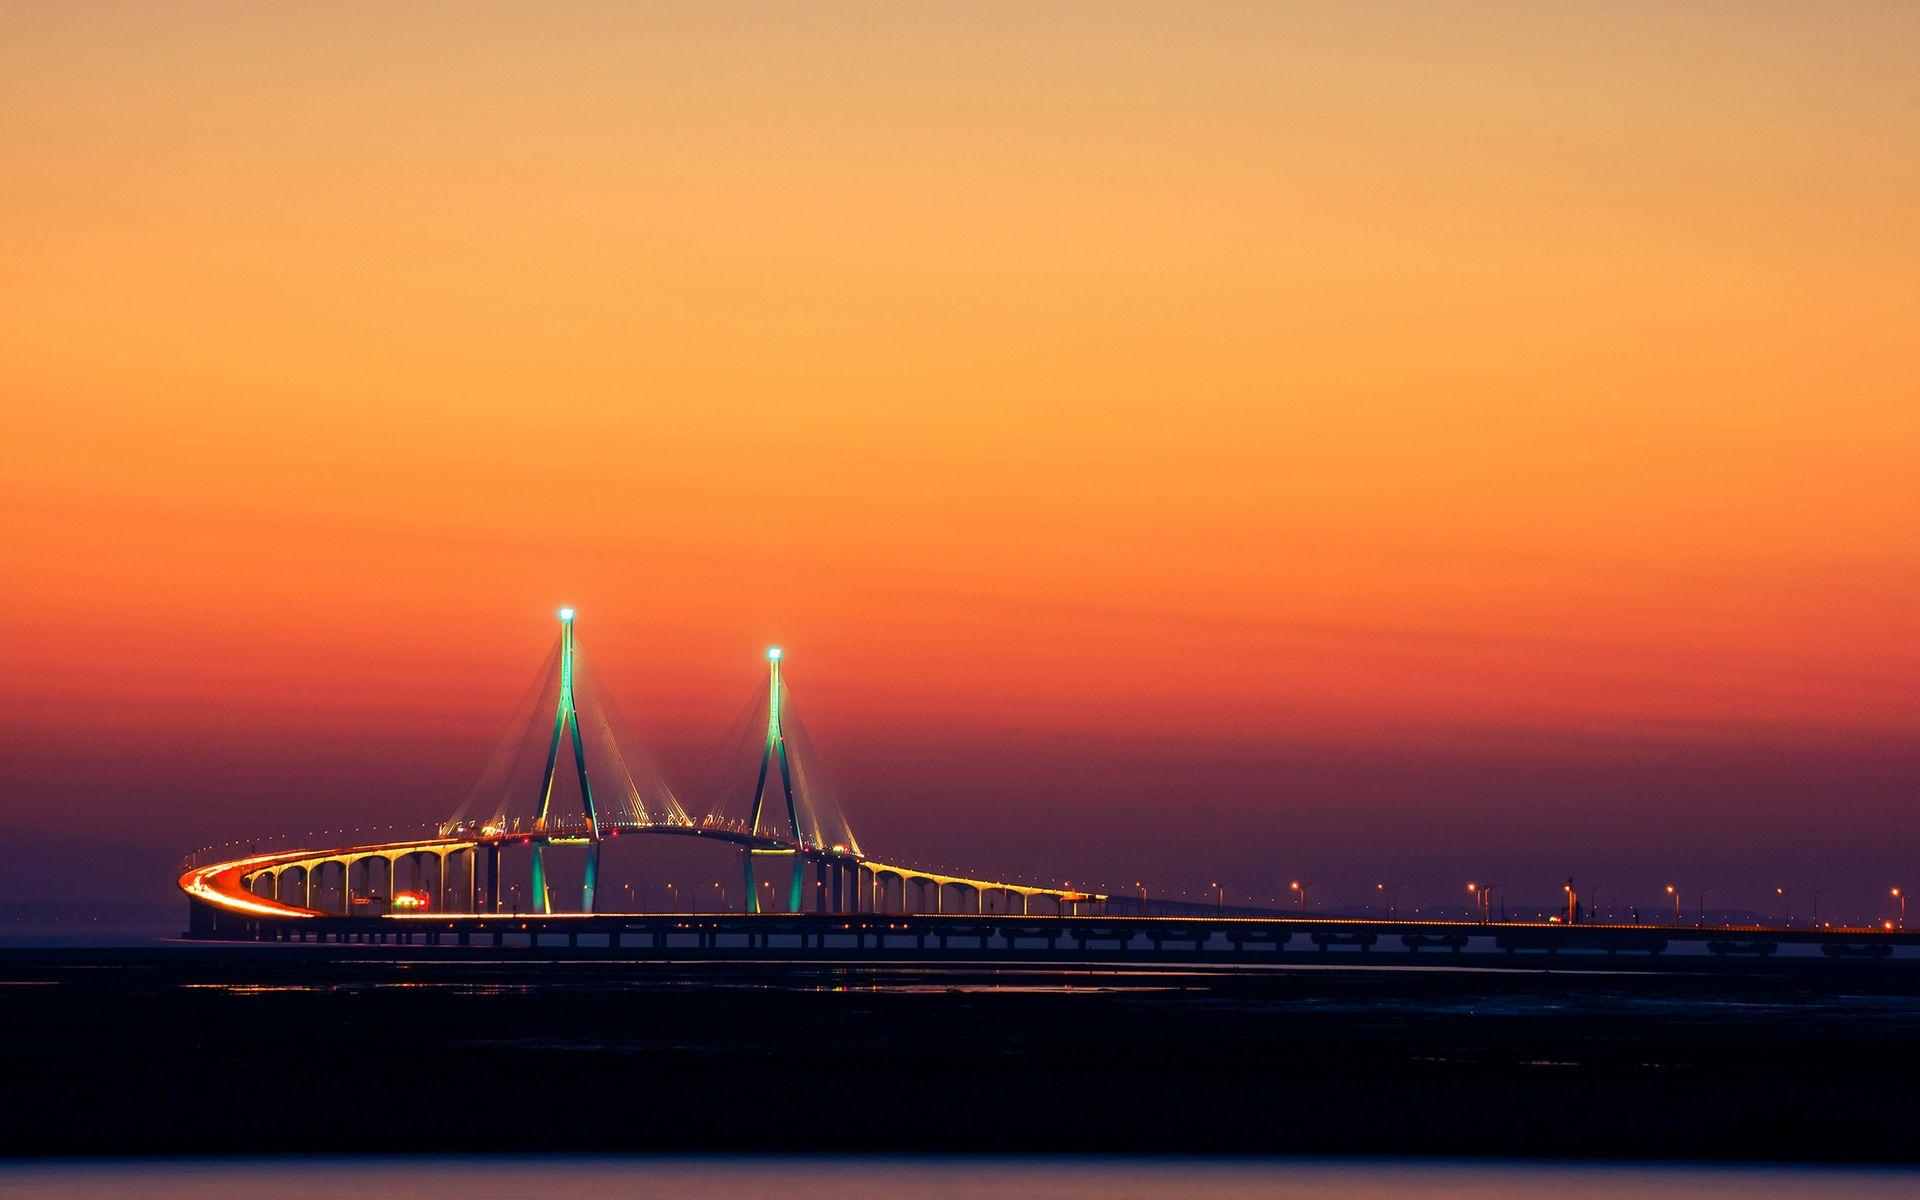 Ultra HD incheon bridge sout korea